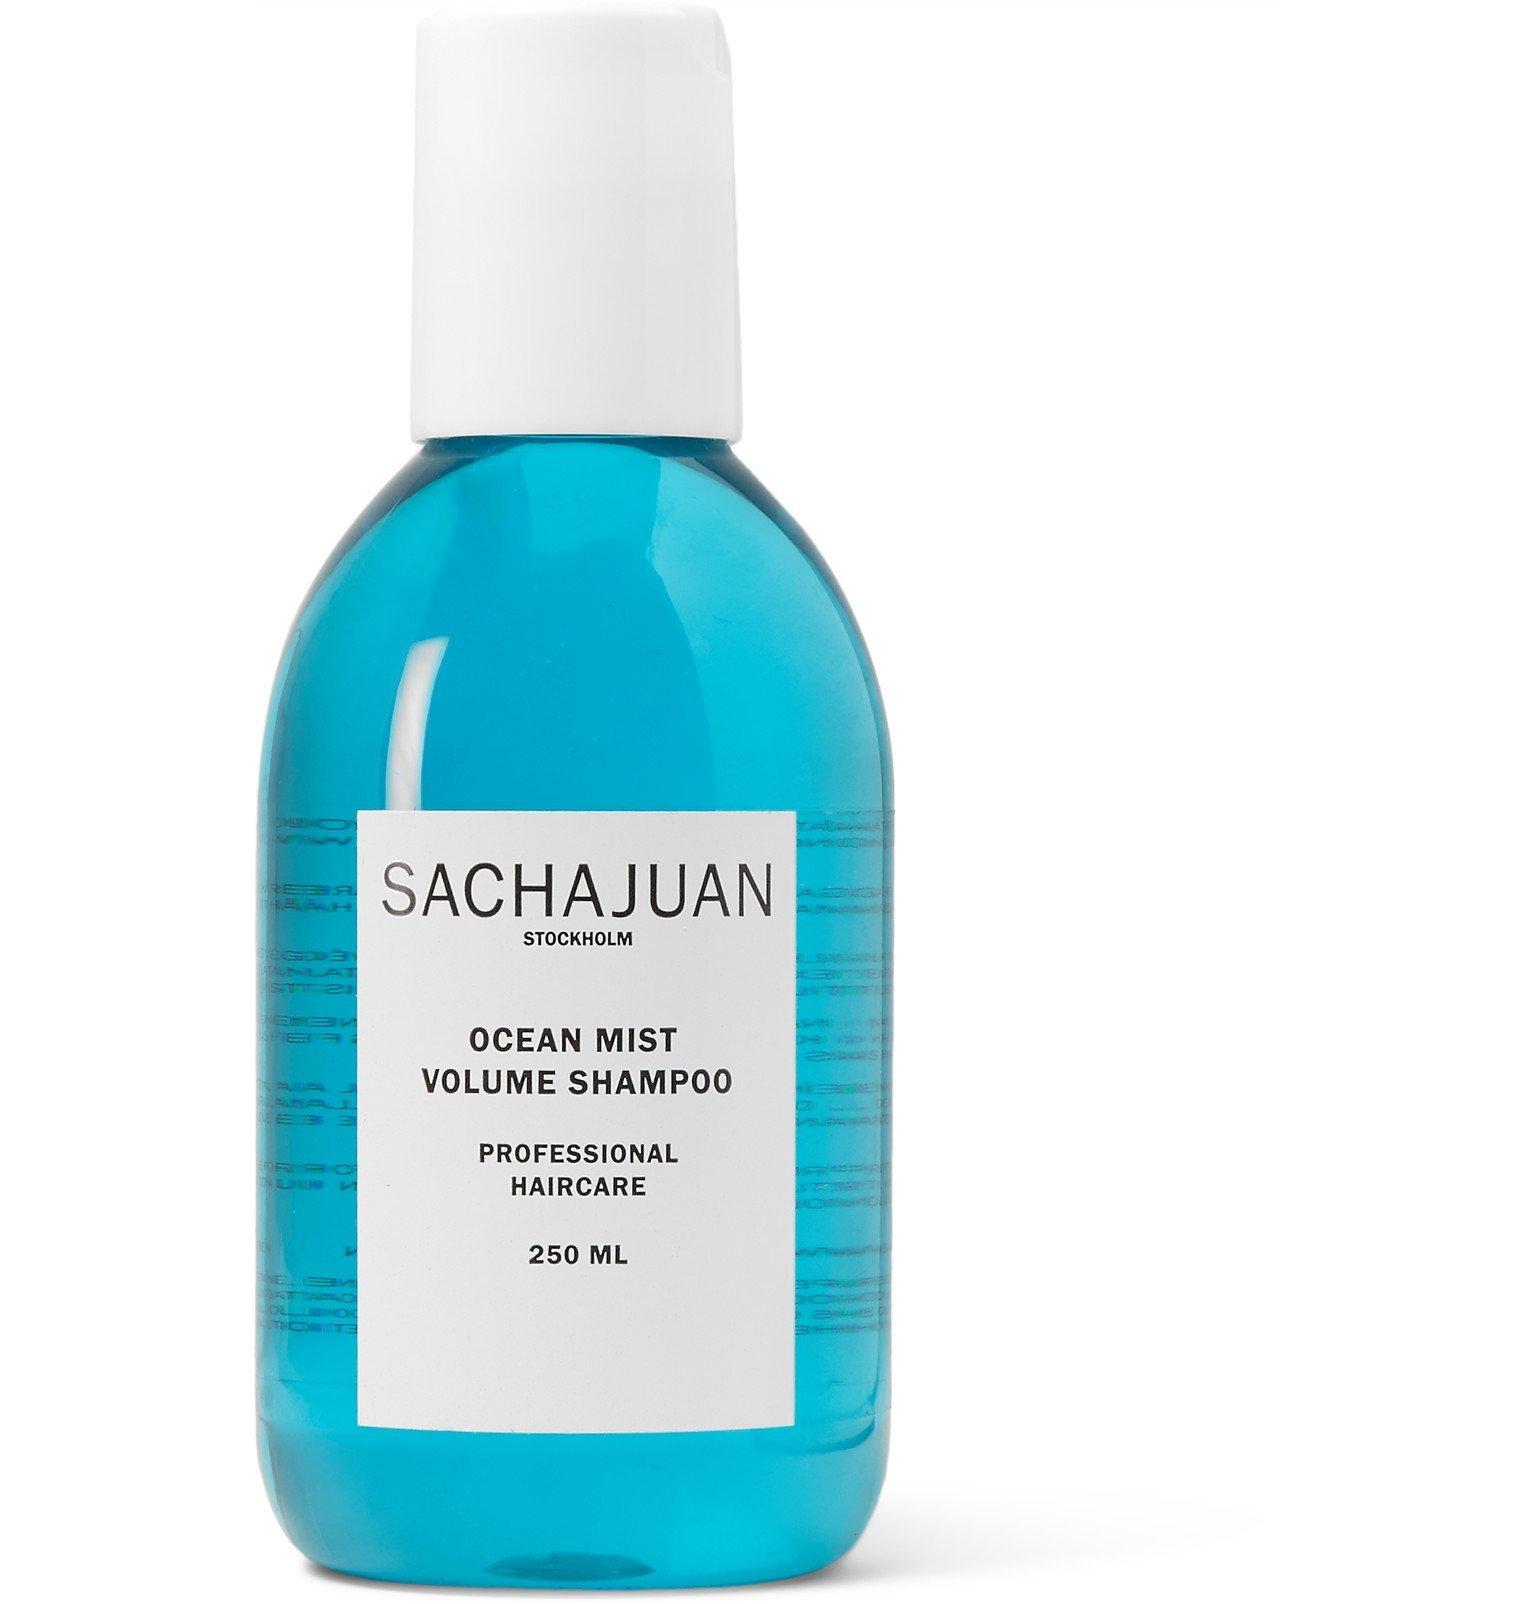 Photo: SACHAJUAN - Ocean Mist Volume Shampoo, 250ml - Colorless